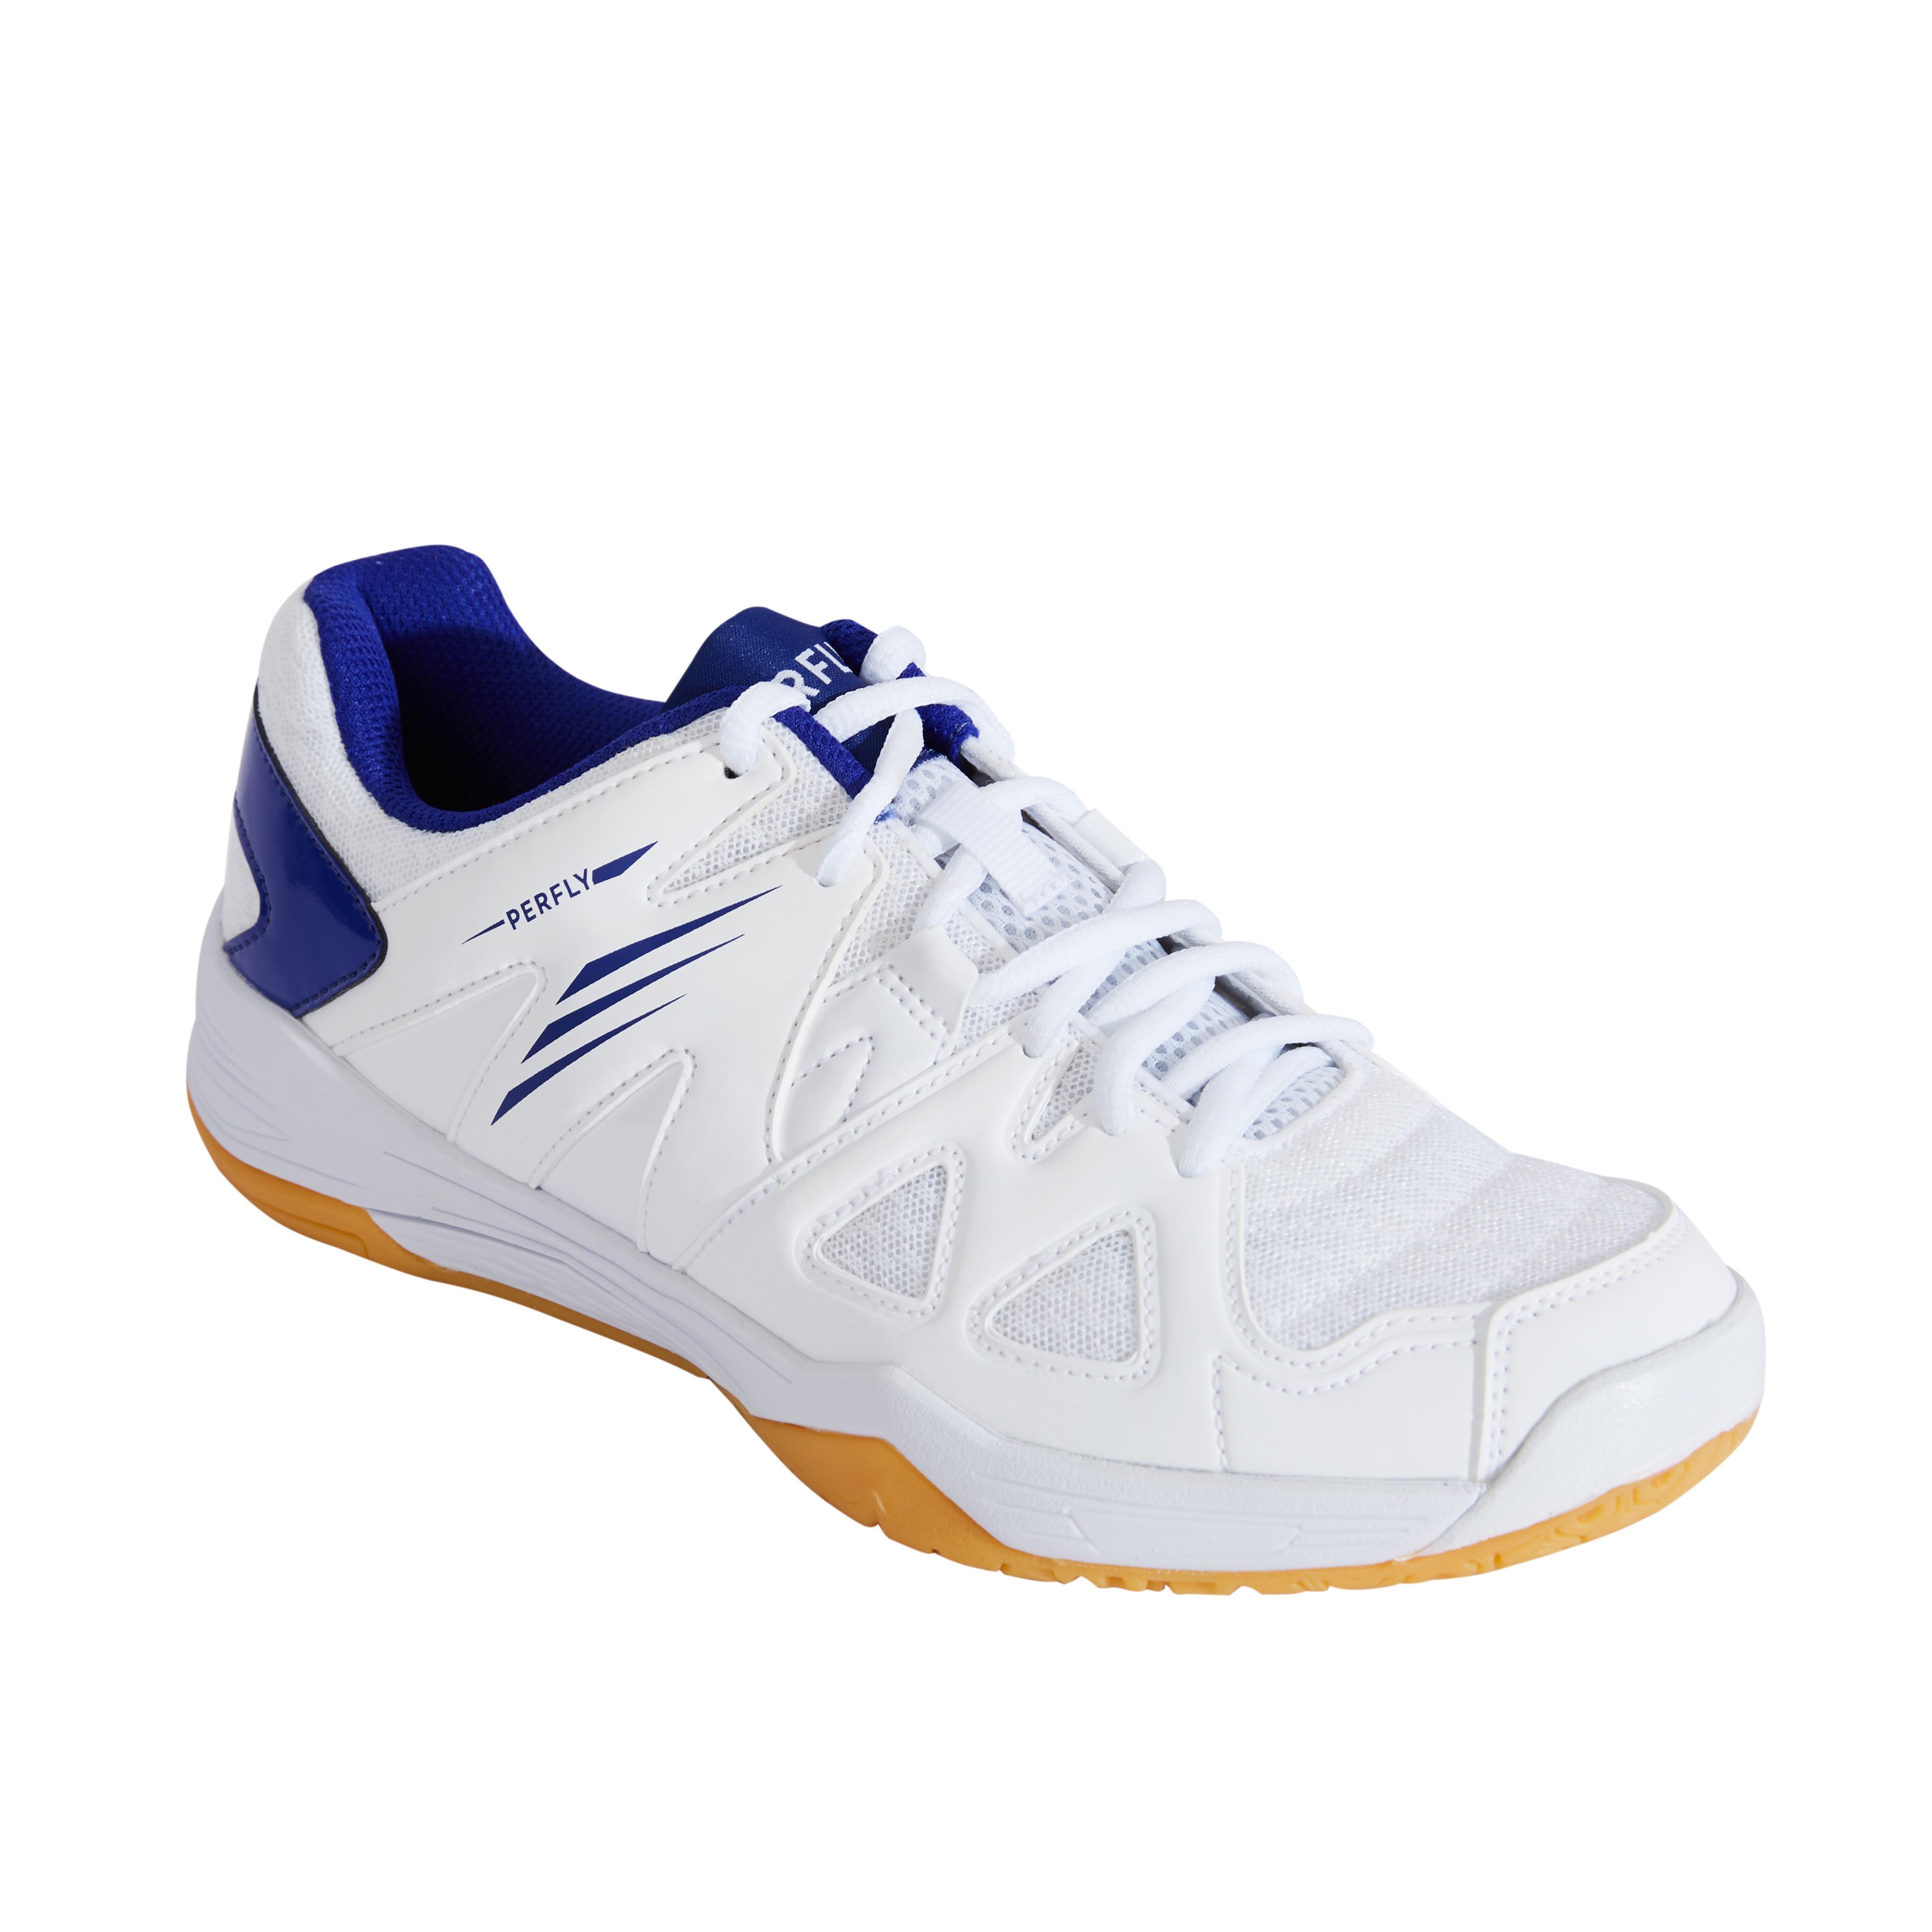 PERFLY Chaussures De Badminton Femme BS530 - Blanc/Bleu - PERFLY - 37